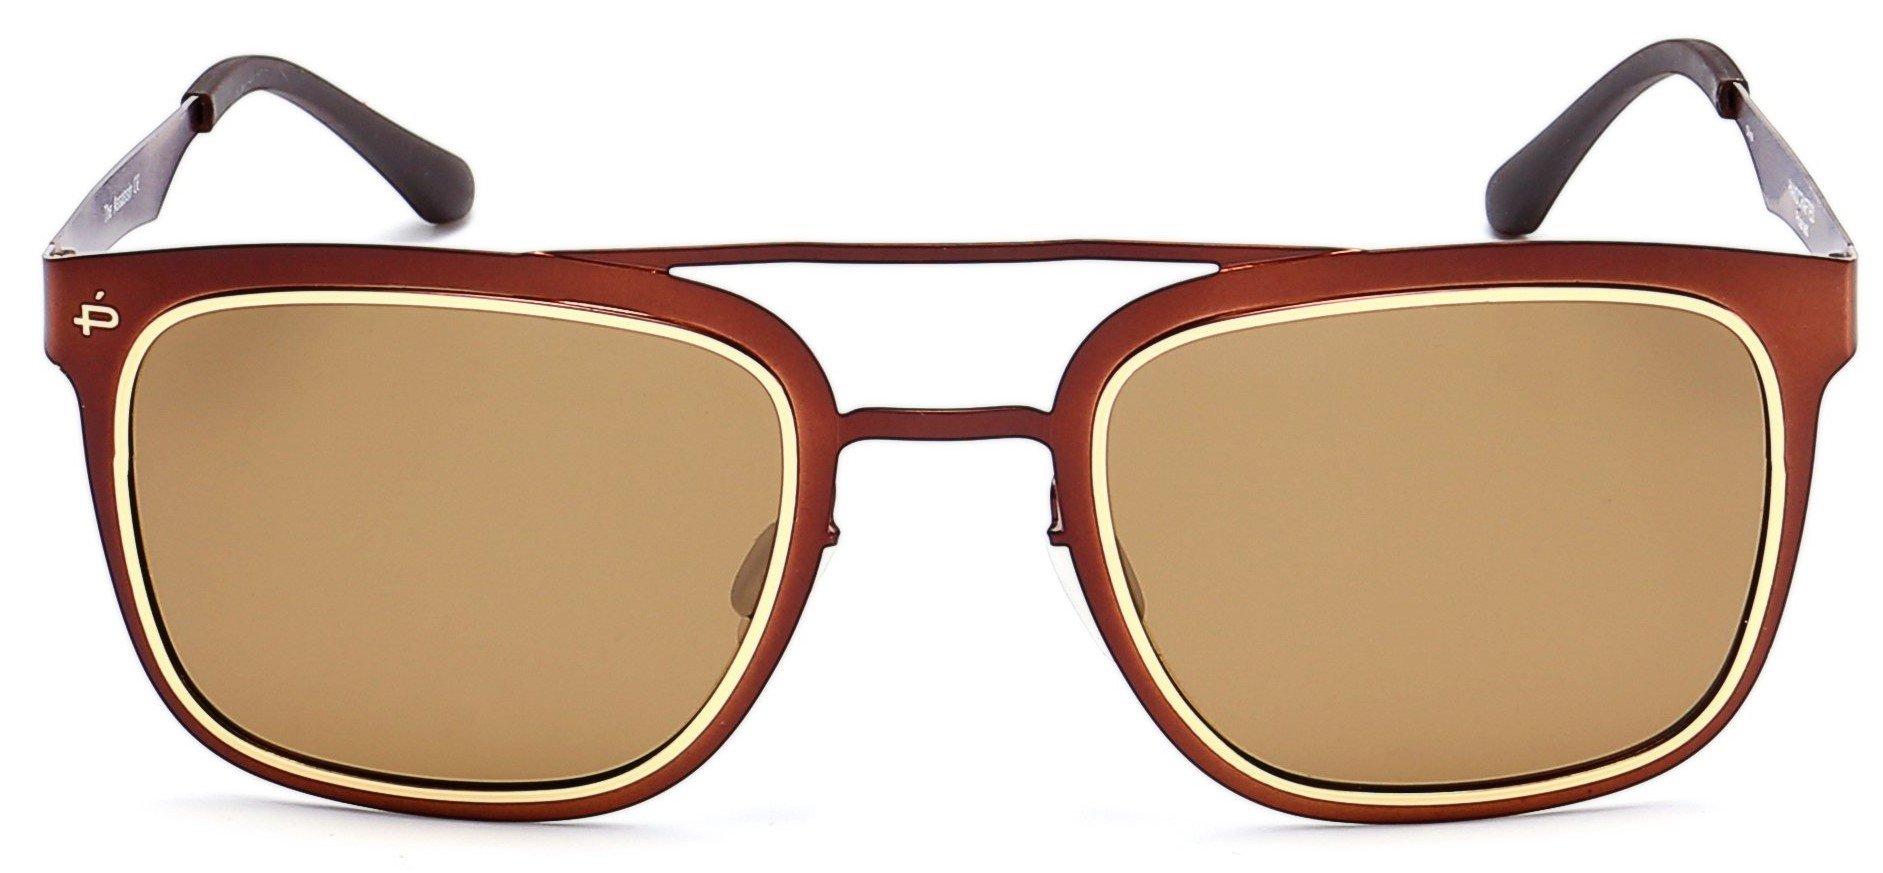 "ویکالا · خرید  اصل اورجینال · خرید از آمازون · PRIVÉ REVAUX ""The Assassin"" Handcrafted Designer Polarized Retro Sunglasses For Men & Women wekala · ویکالا"